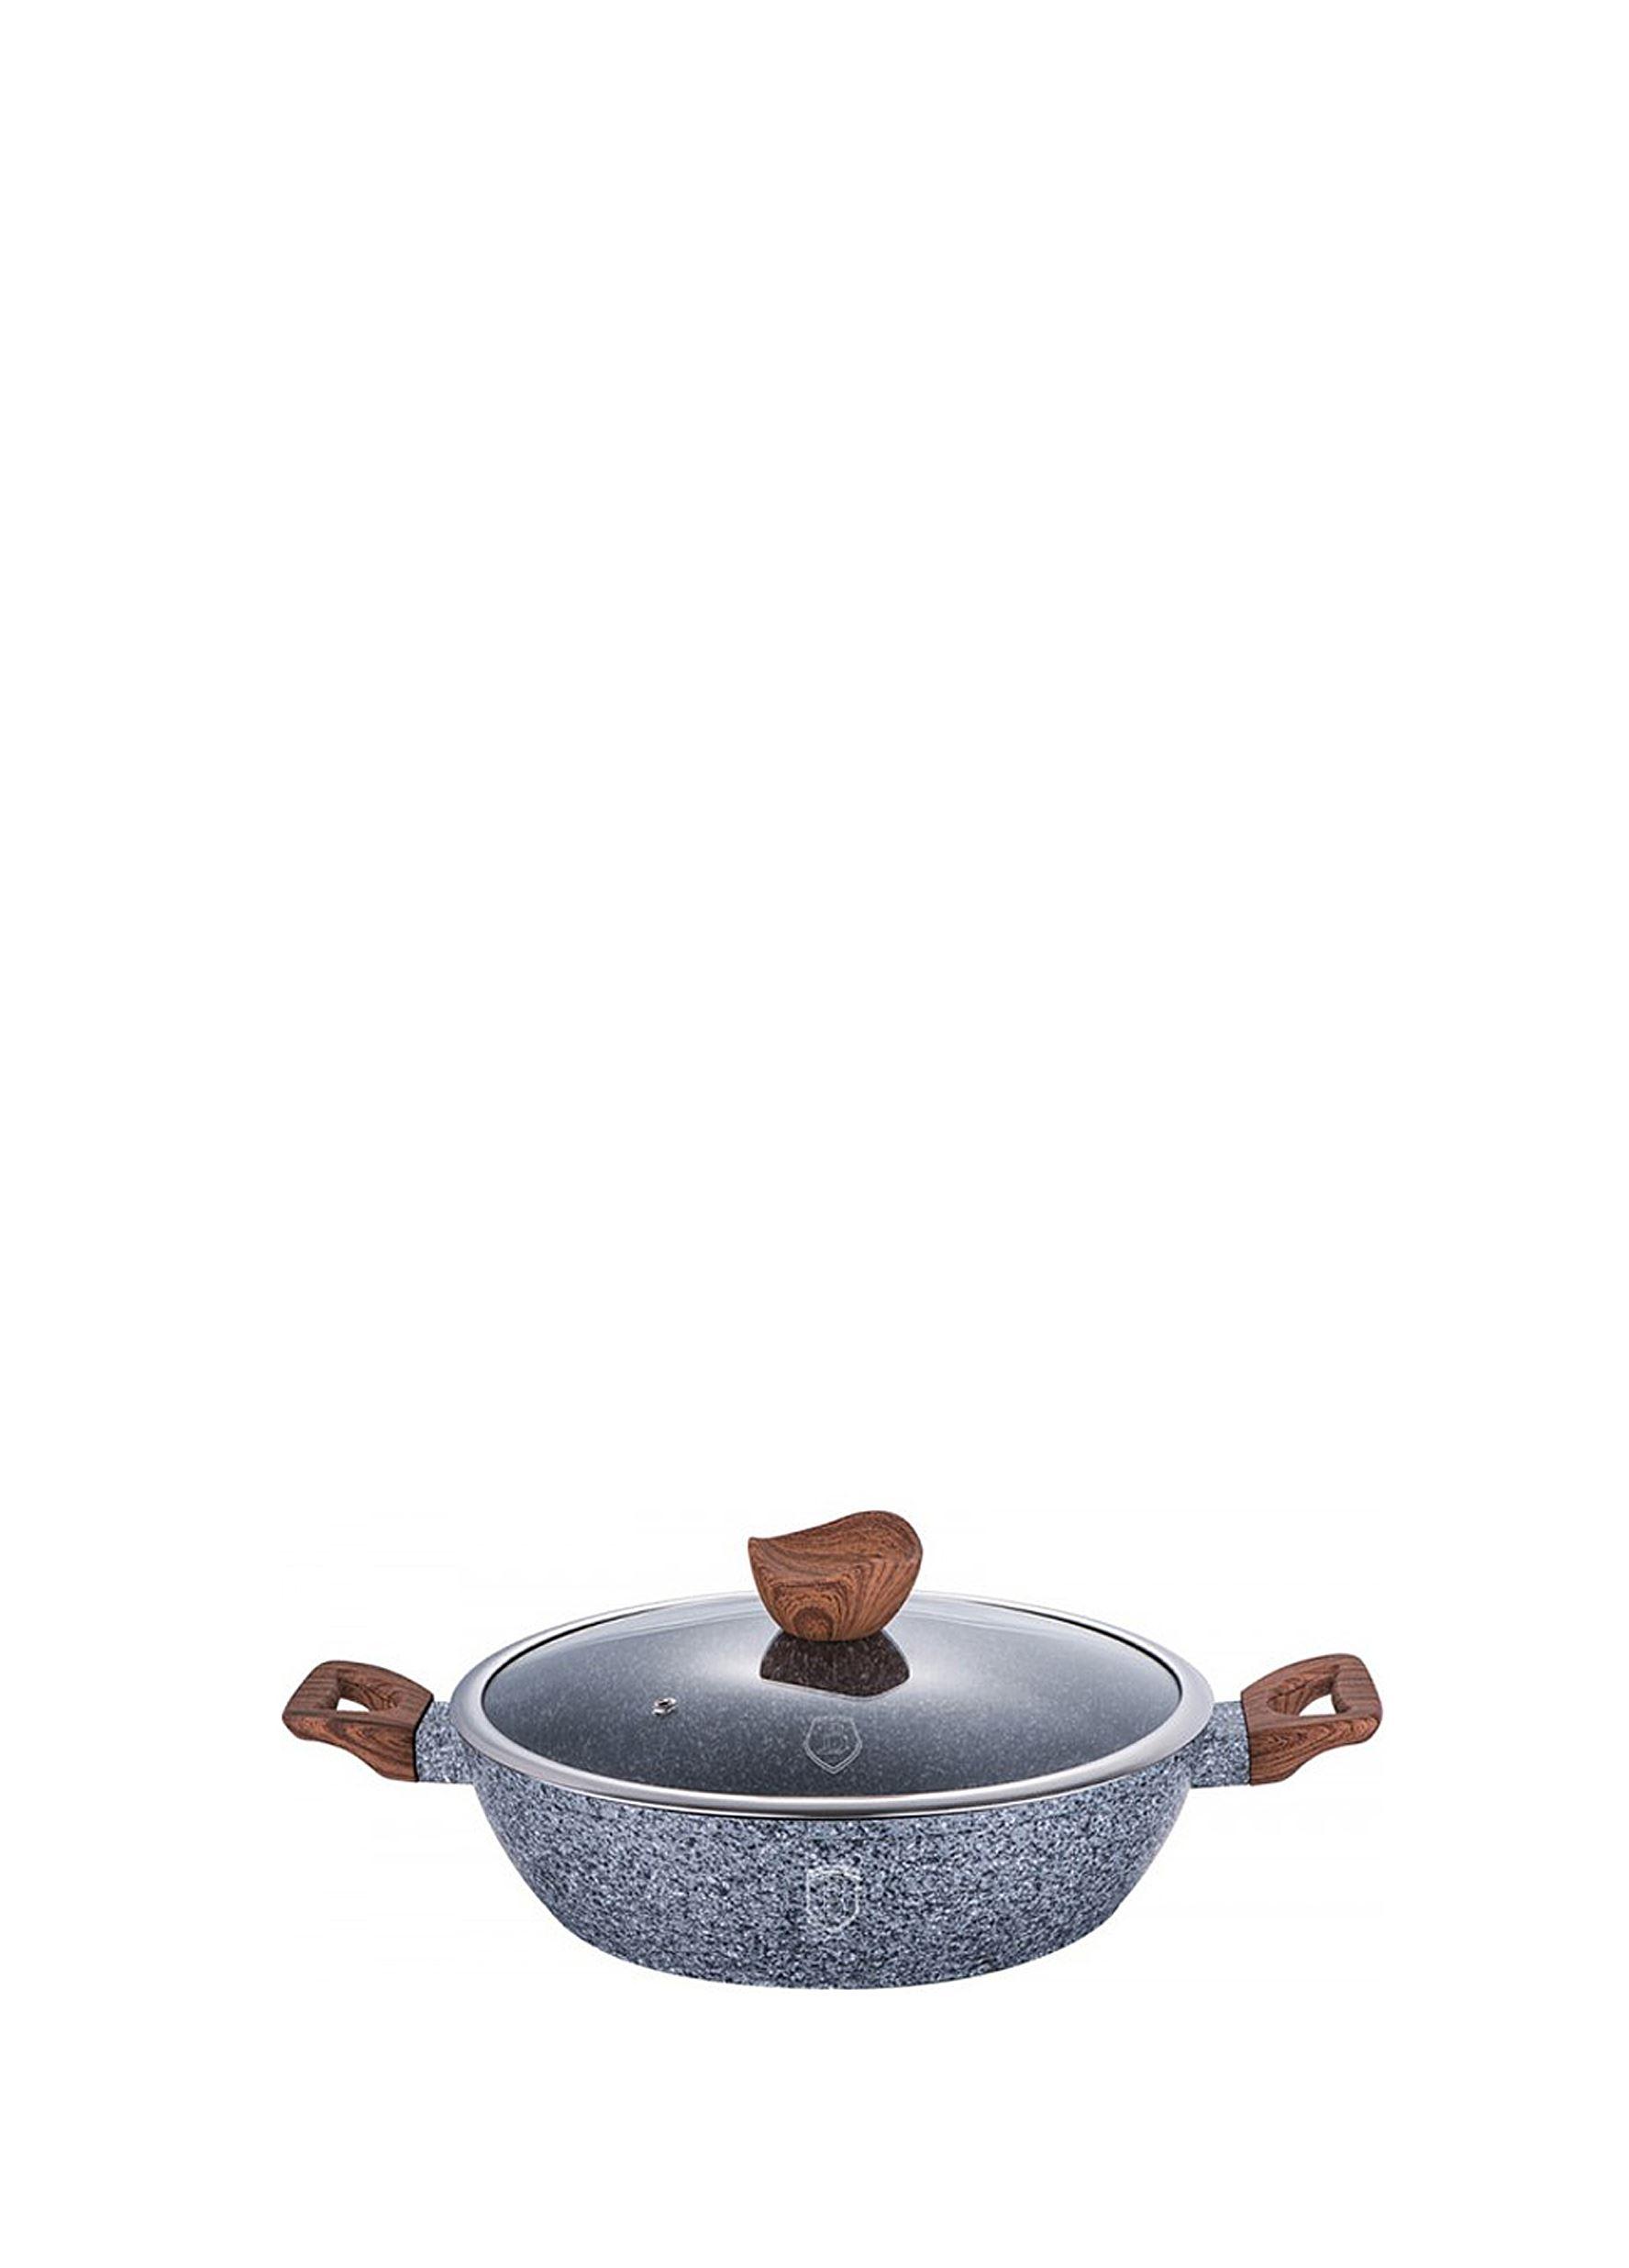 Kitchen Lab - Ρηχή κατσαρόλα με γυάλινο καπάκι 32 cm Berlinger Haus